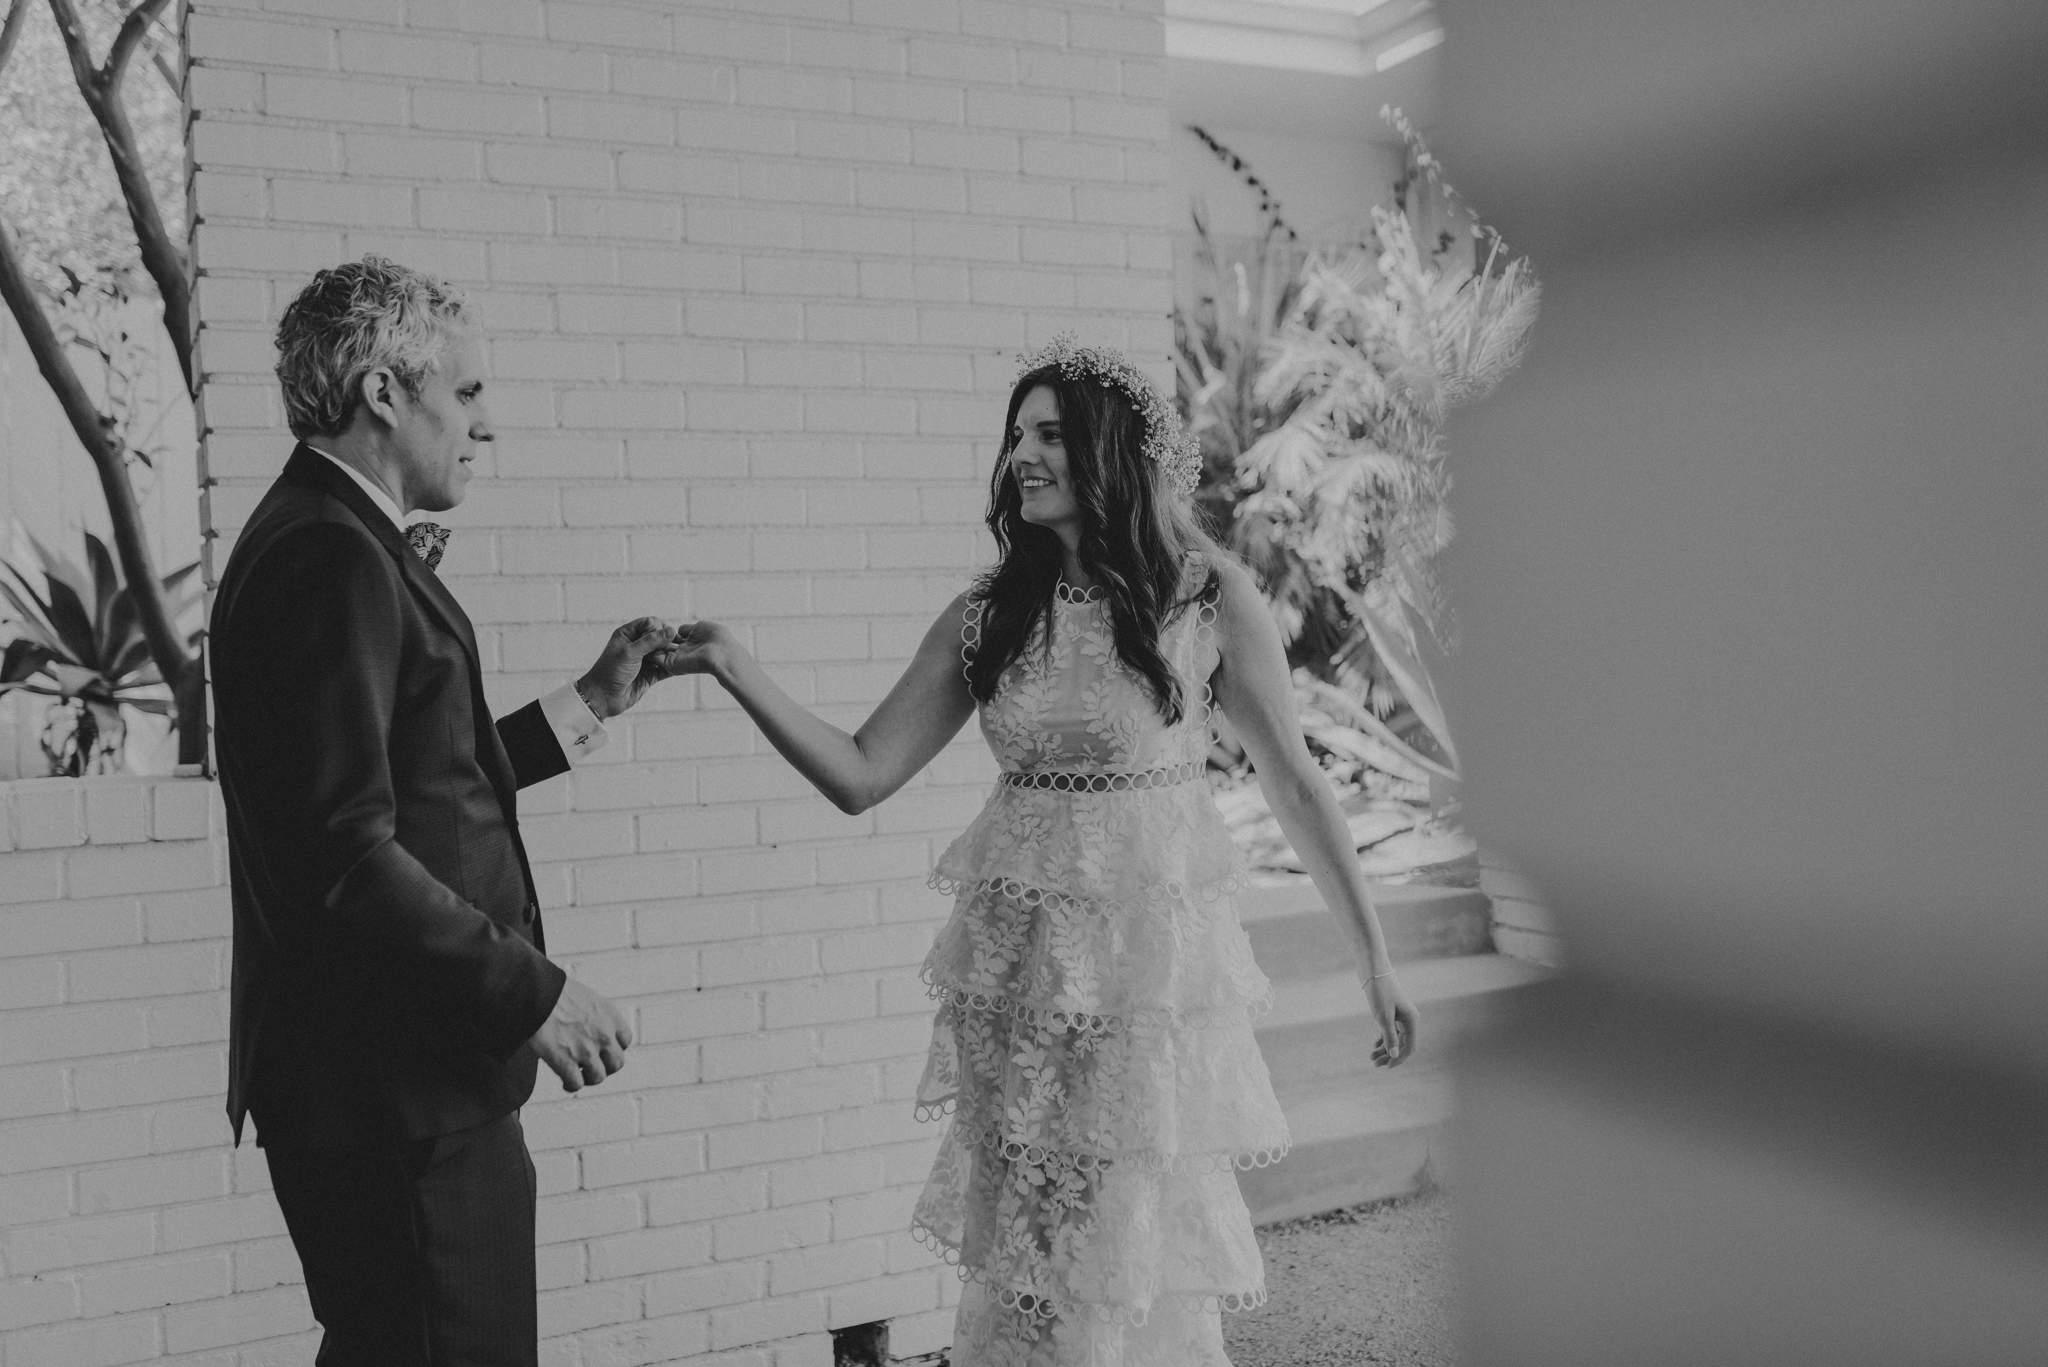 Isaiah + Taylor Photography - Private Estate Backyard Wedding - Beverly Hills - Los Angeles Wedding Photographer - 35.jpg